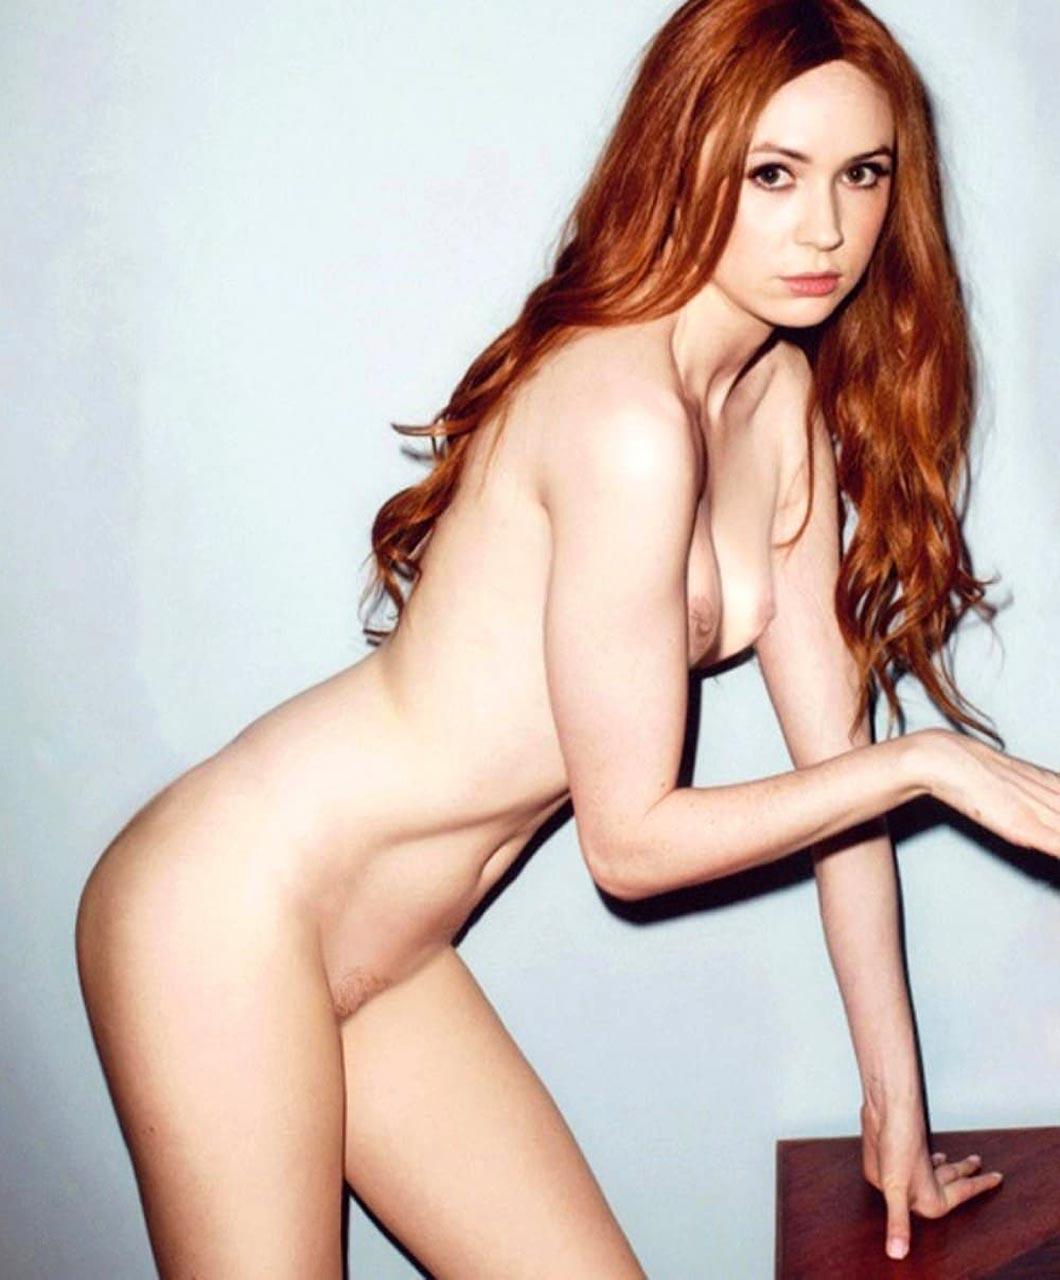 Nude pics of Karen Gillan